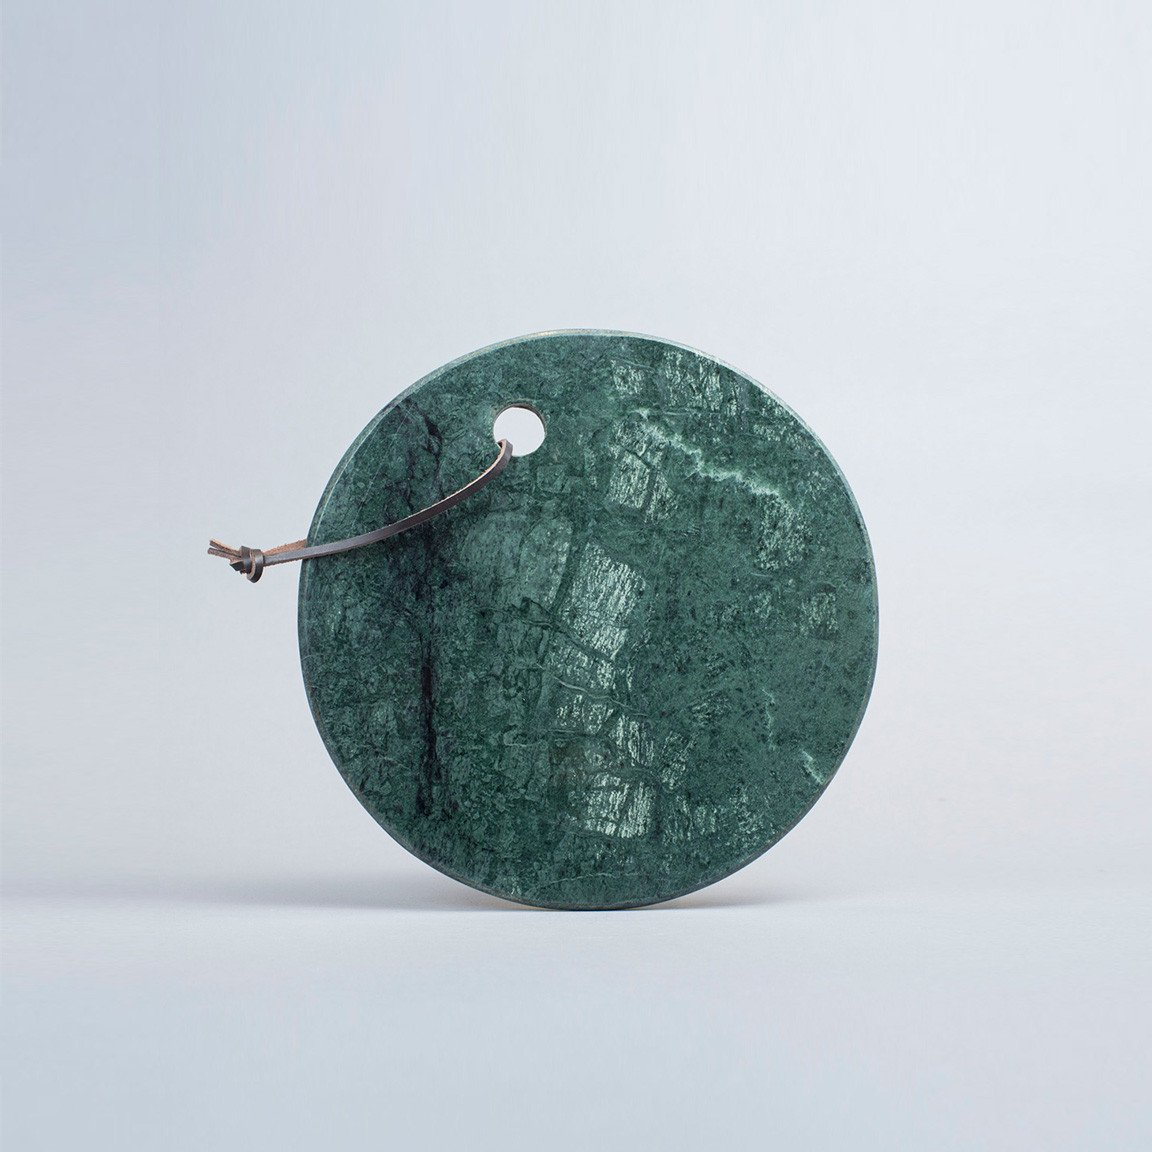 handmade decor items cutting board green marble by madam stolz